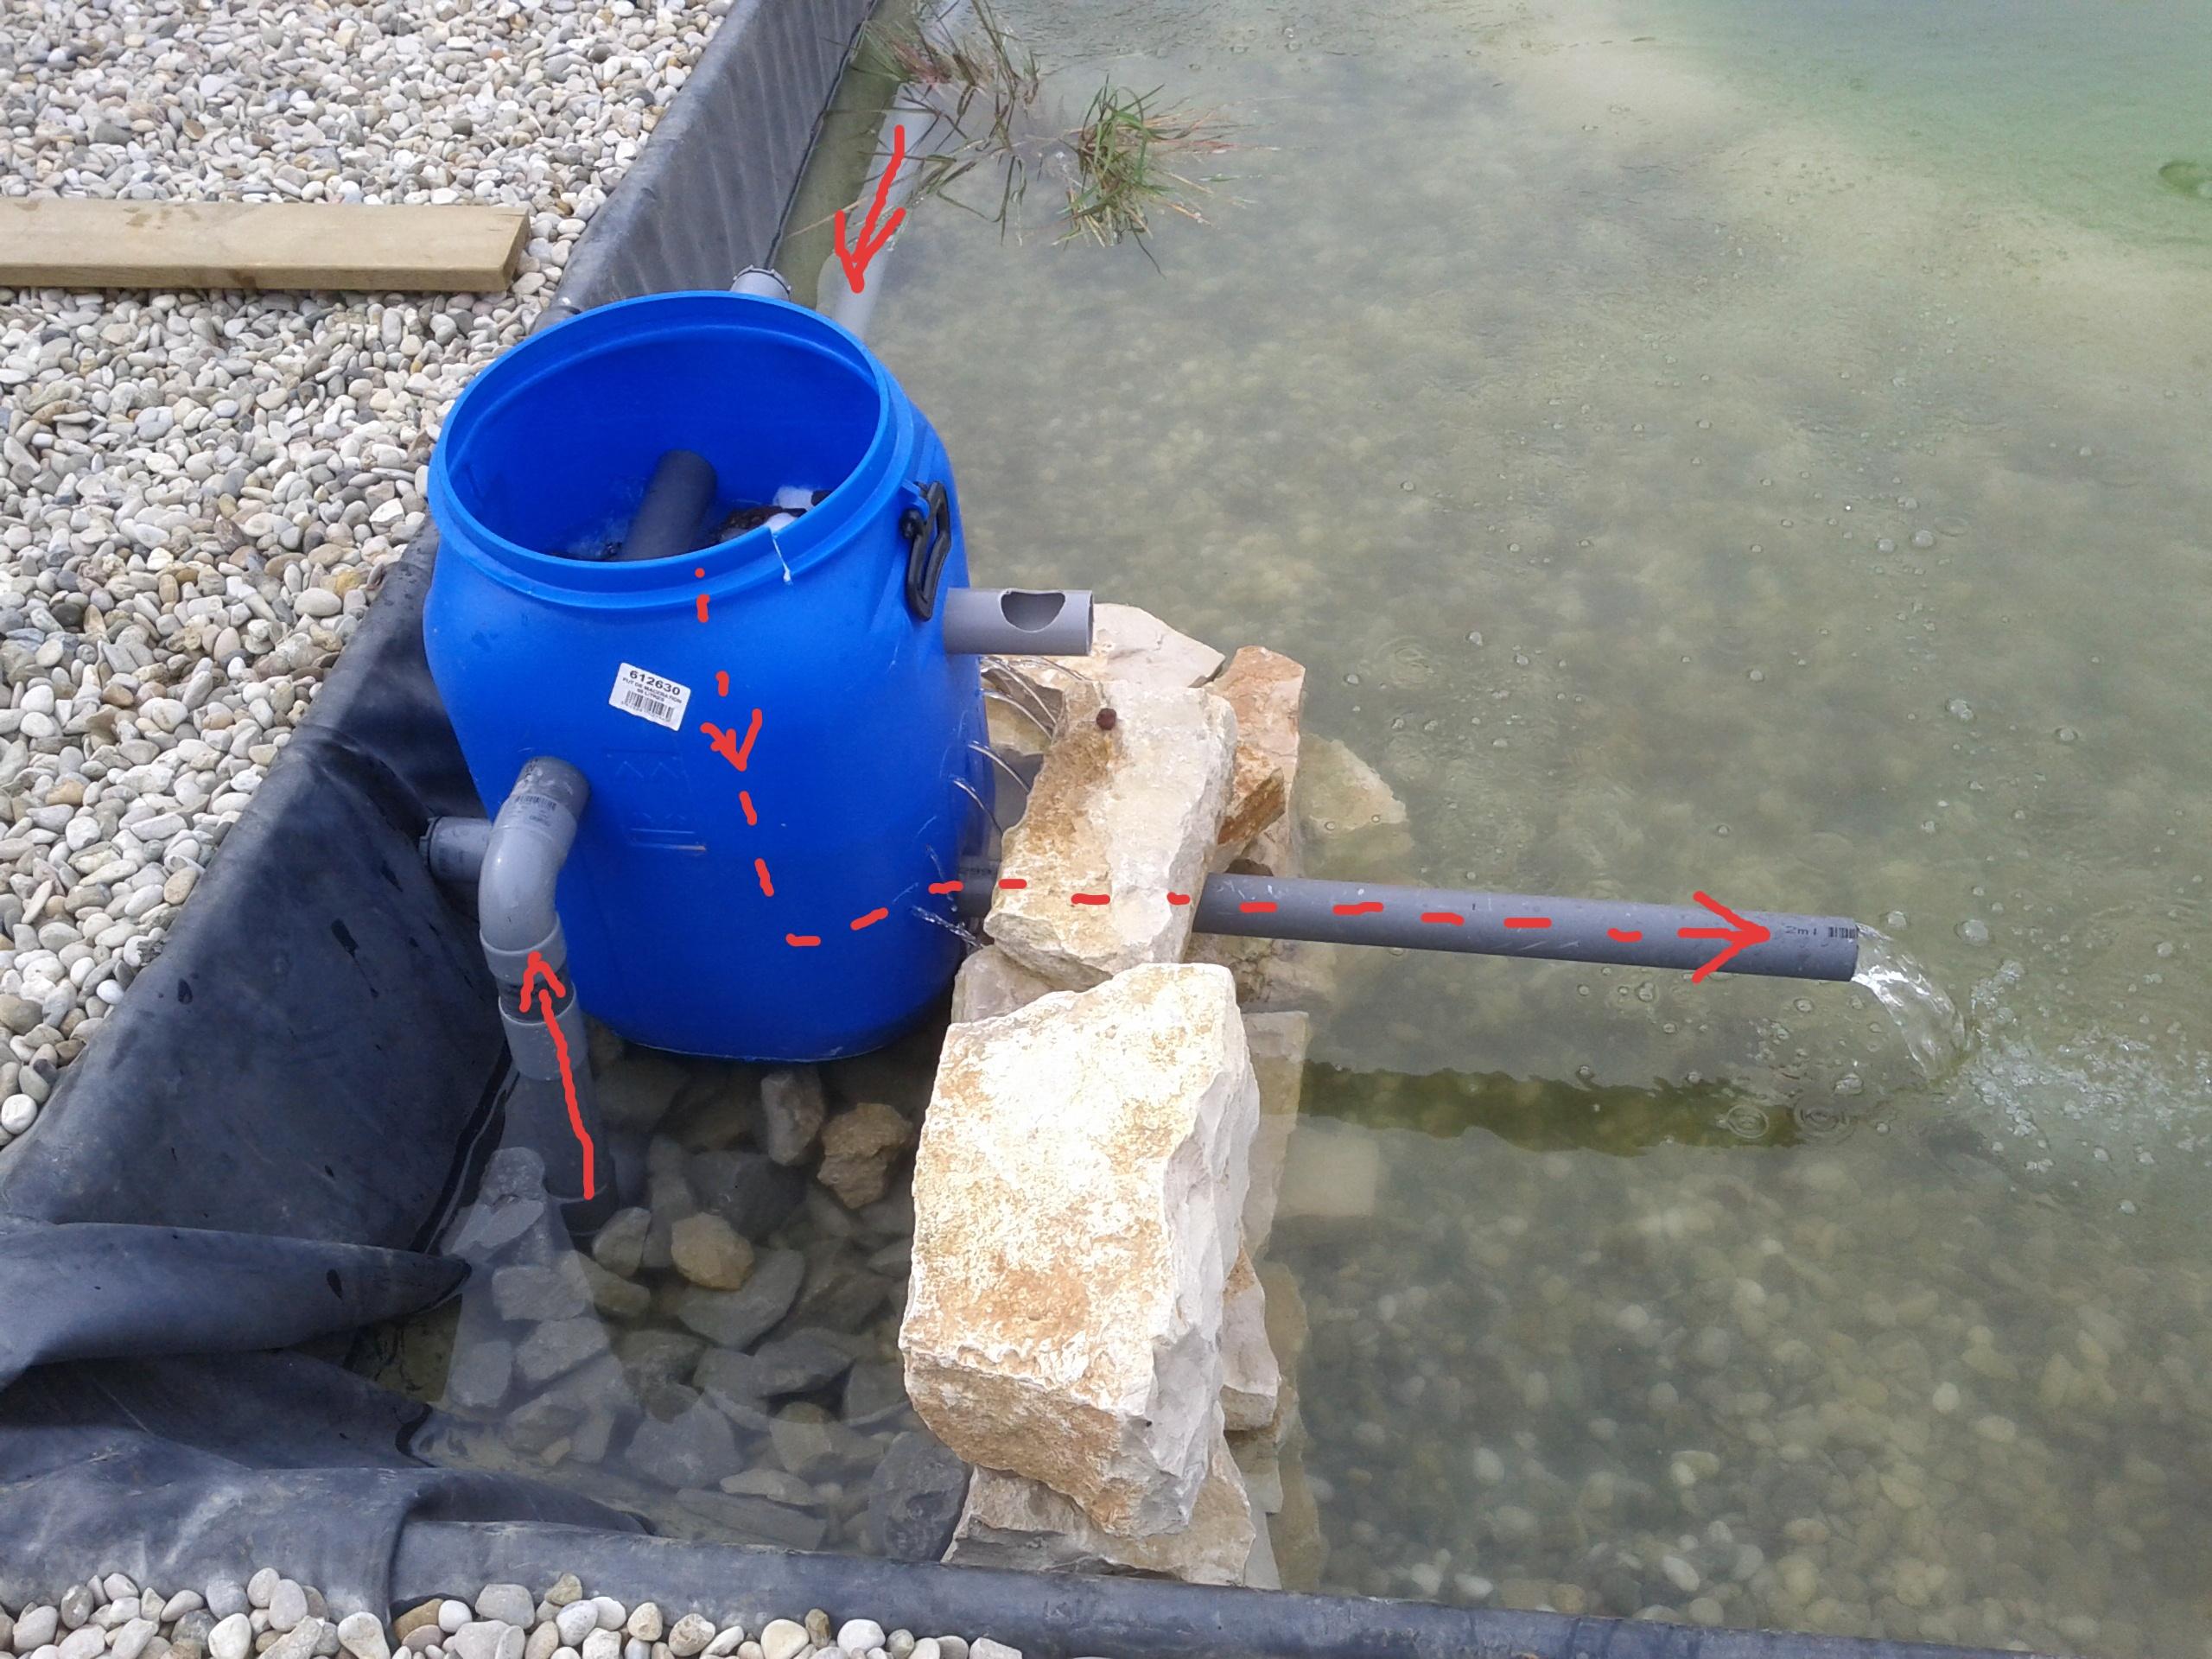 Fontaine filtrante piscine naturellepiscine naturelle for Fontaine pour piscine